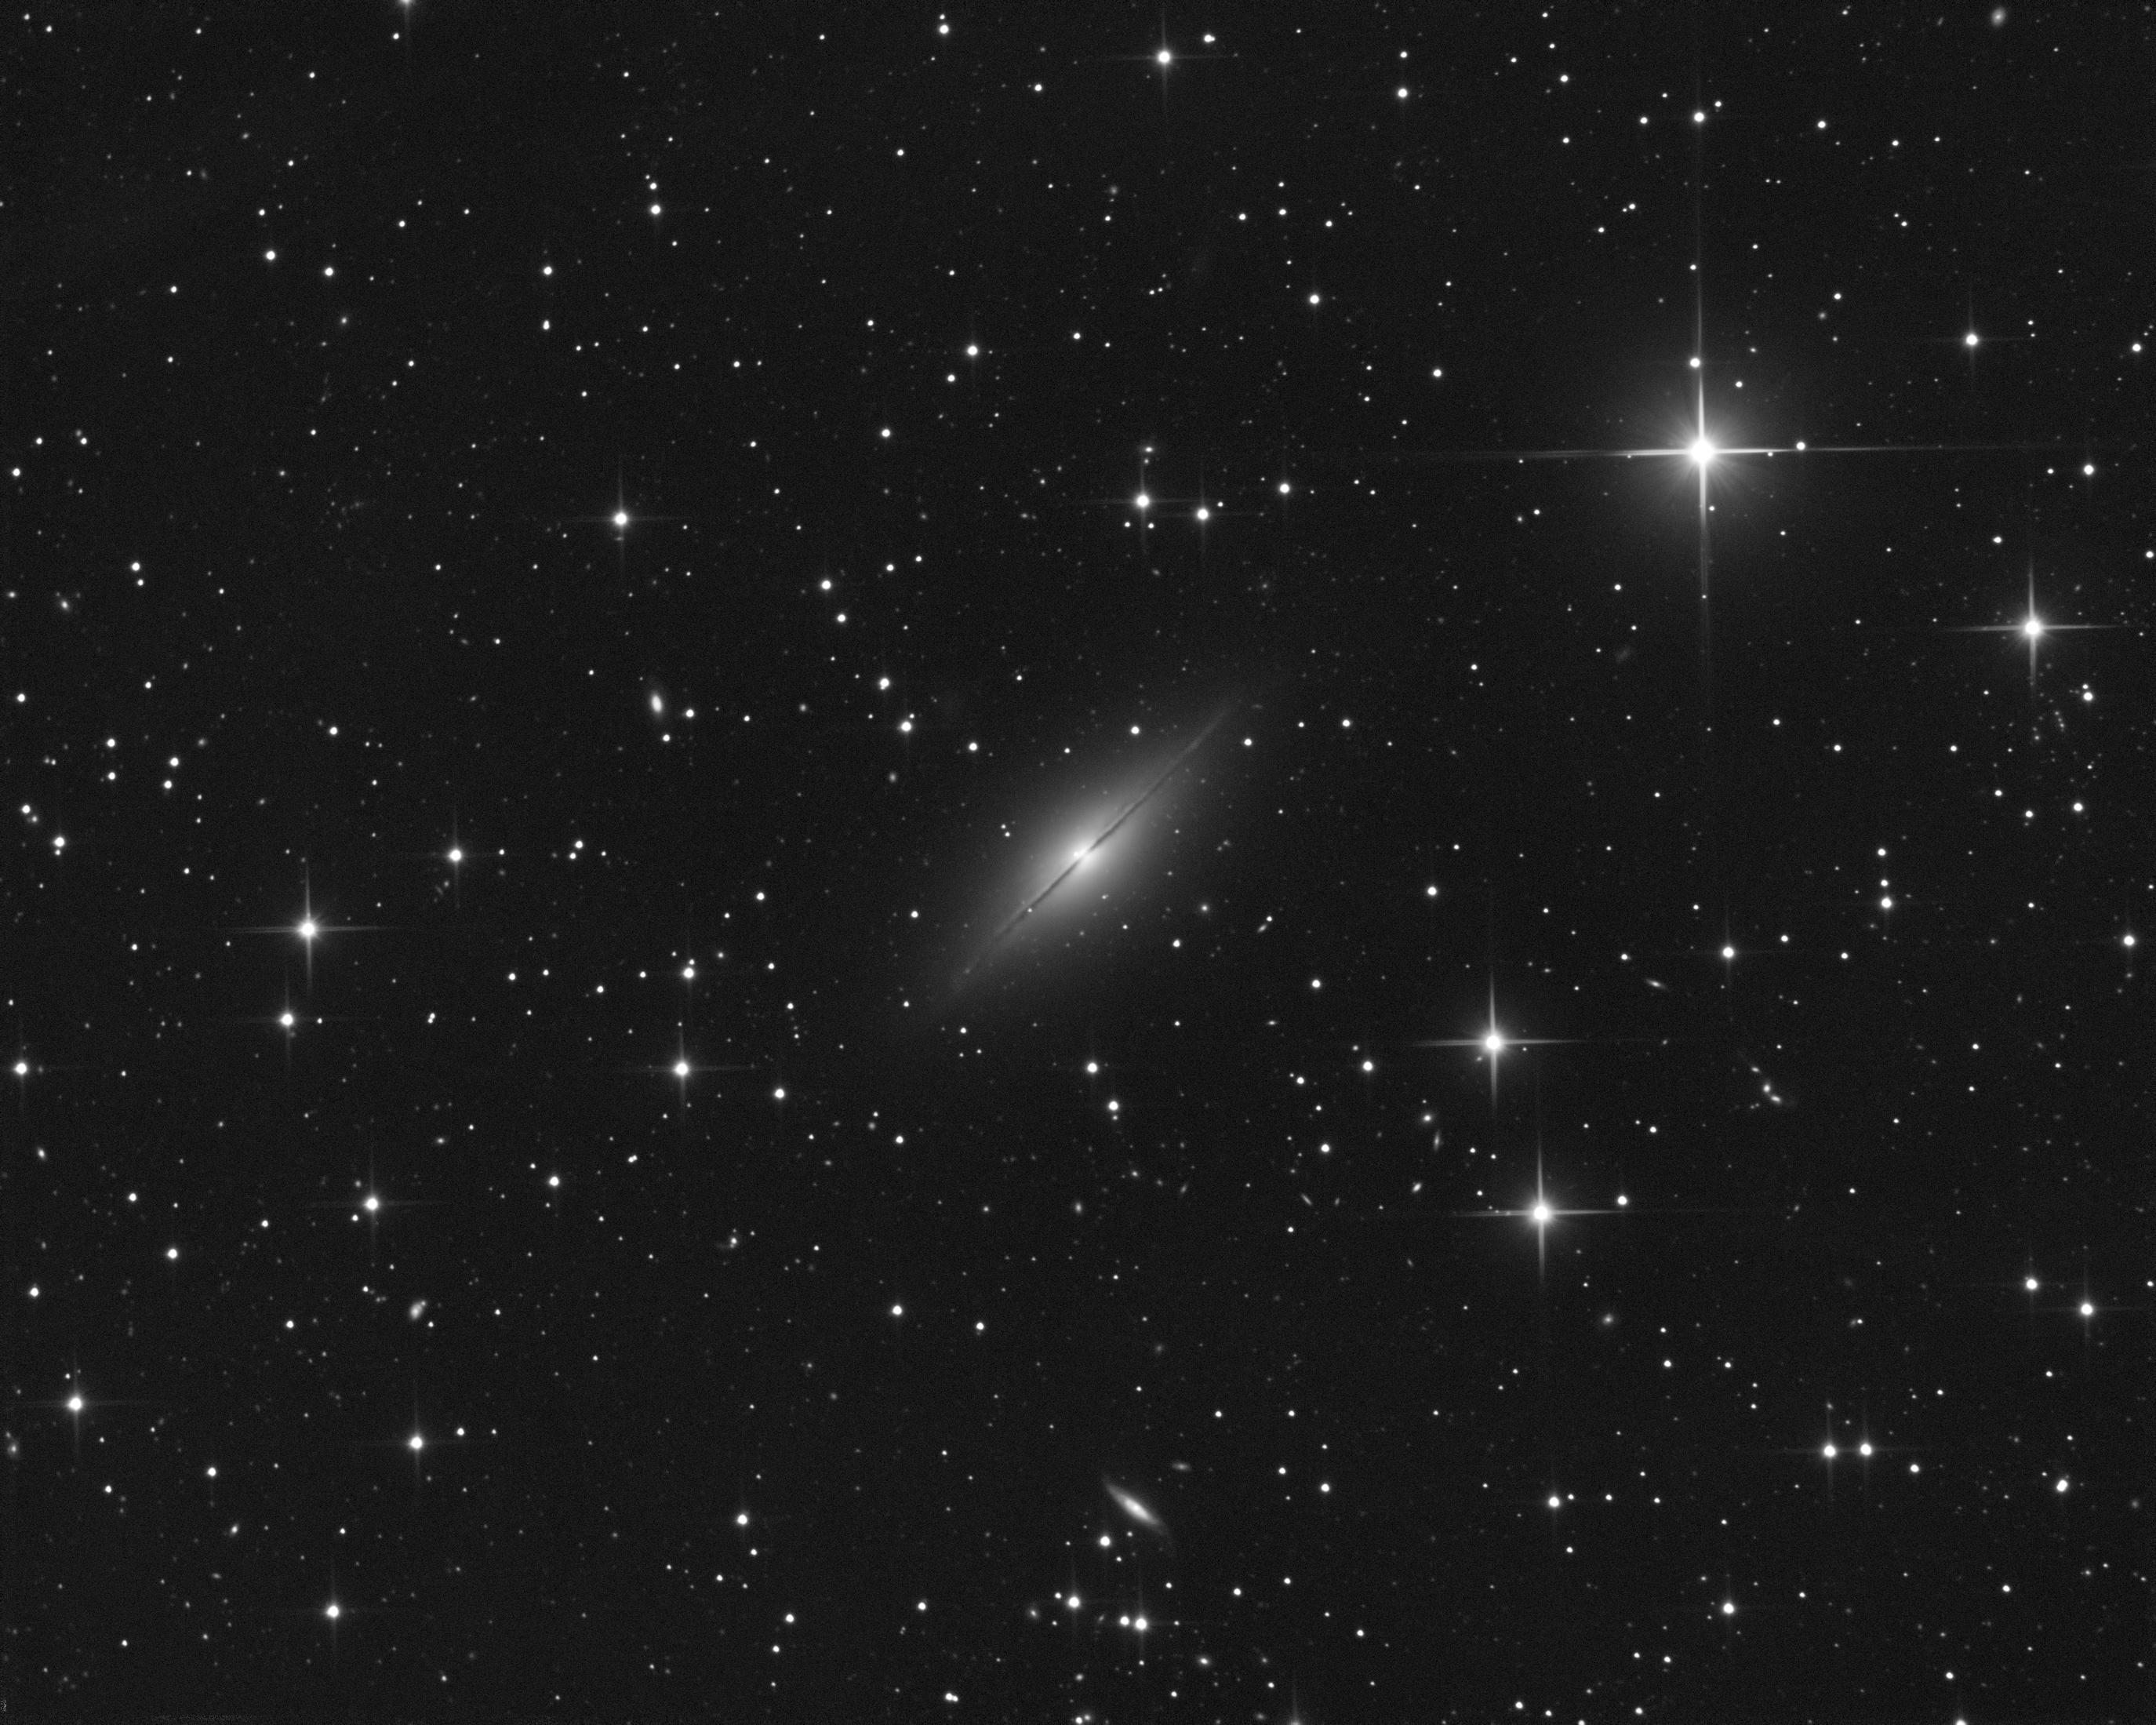 Supernova 2021rhu dans la galaxie NGC7814 Ngc7814_brut